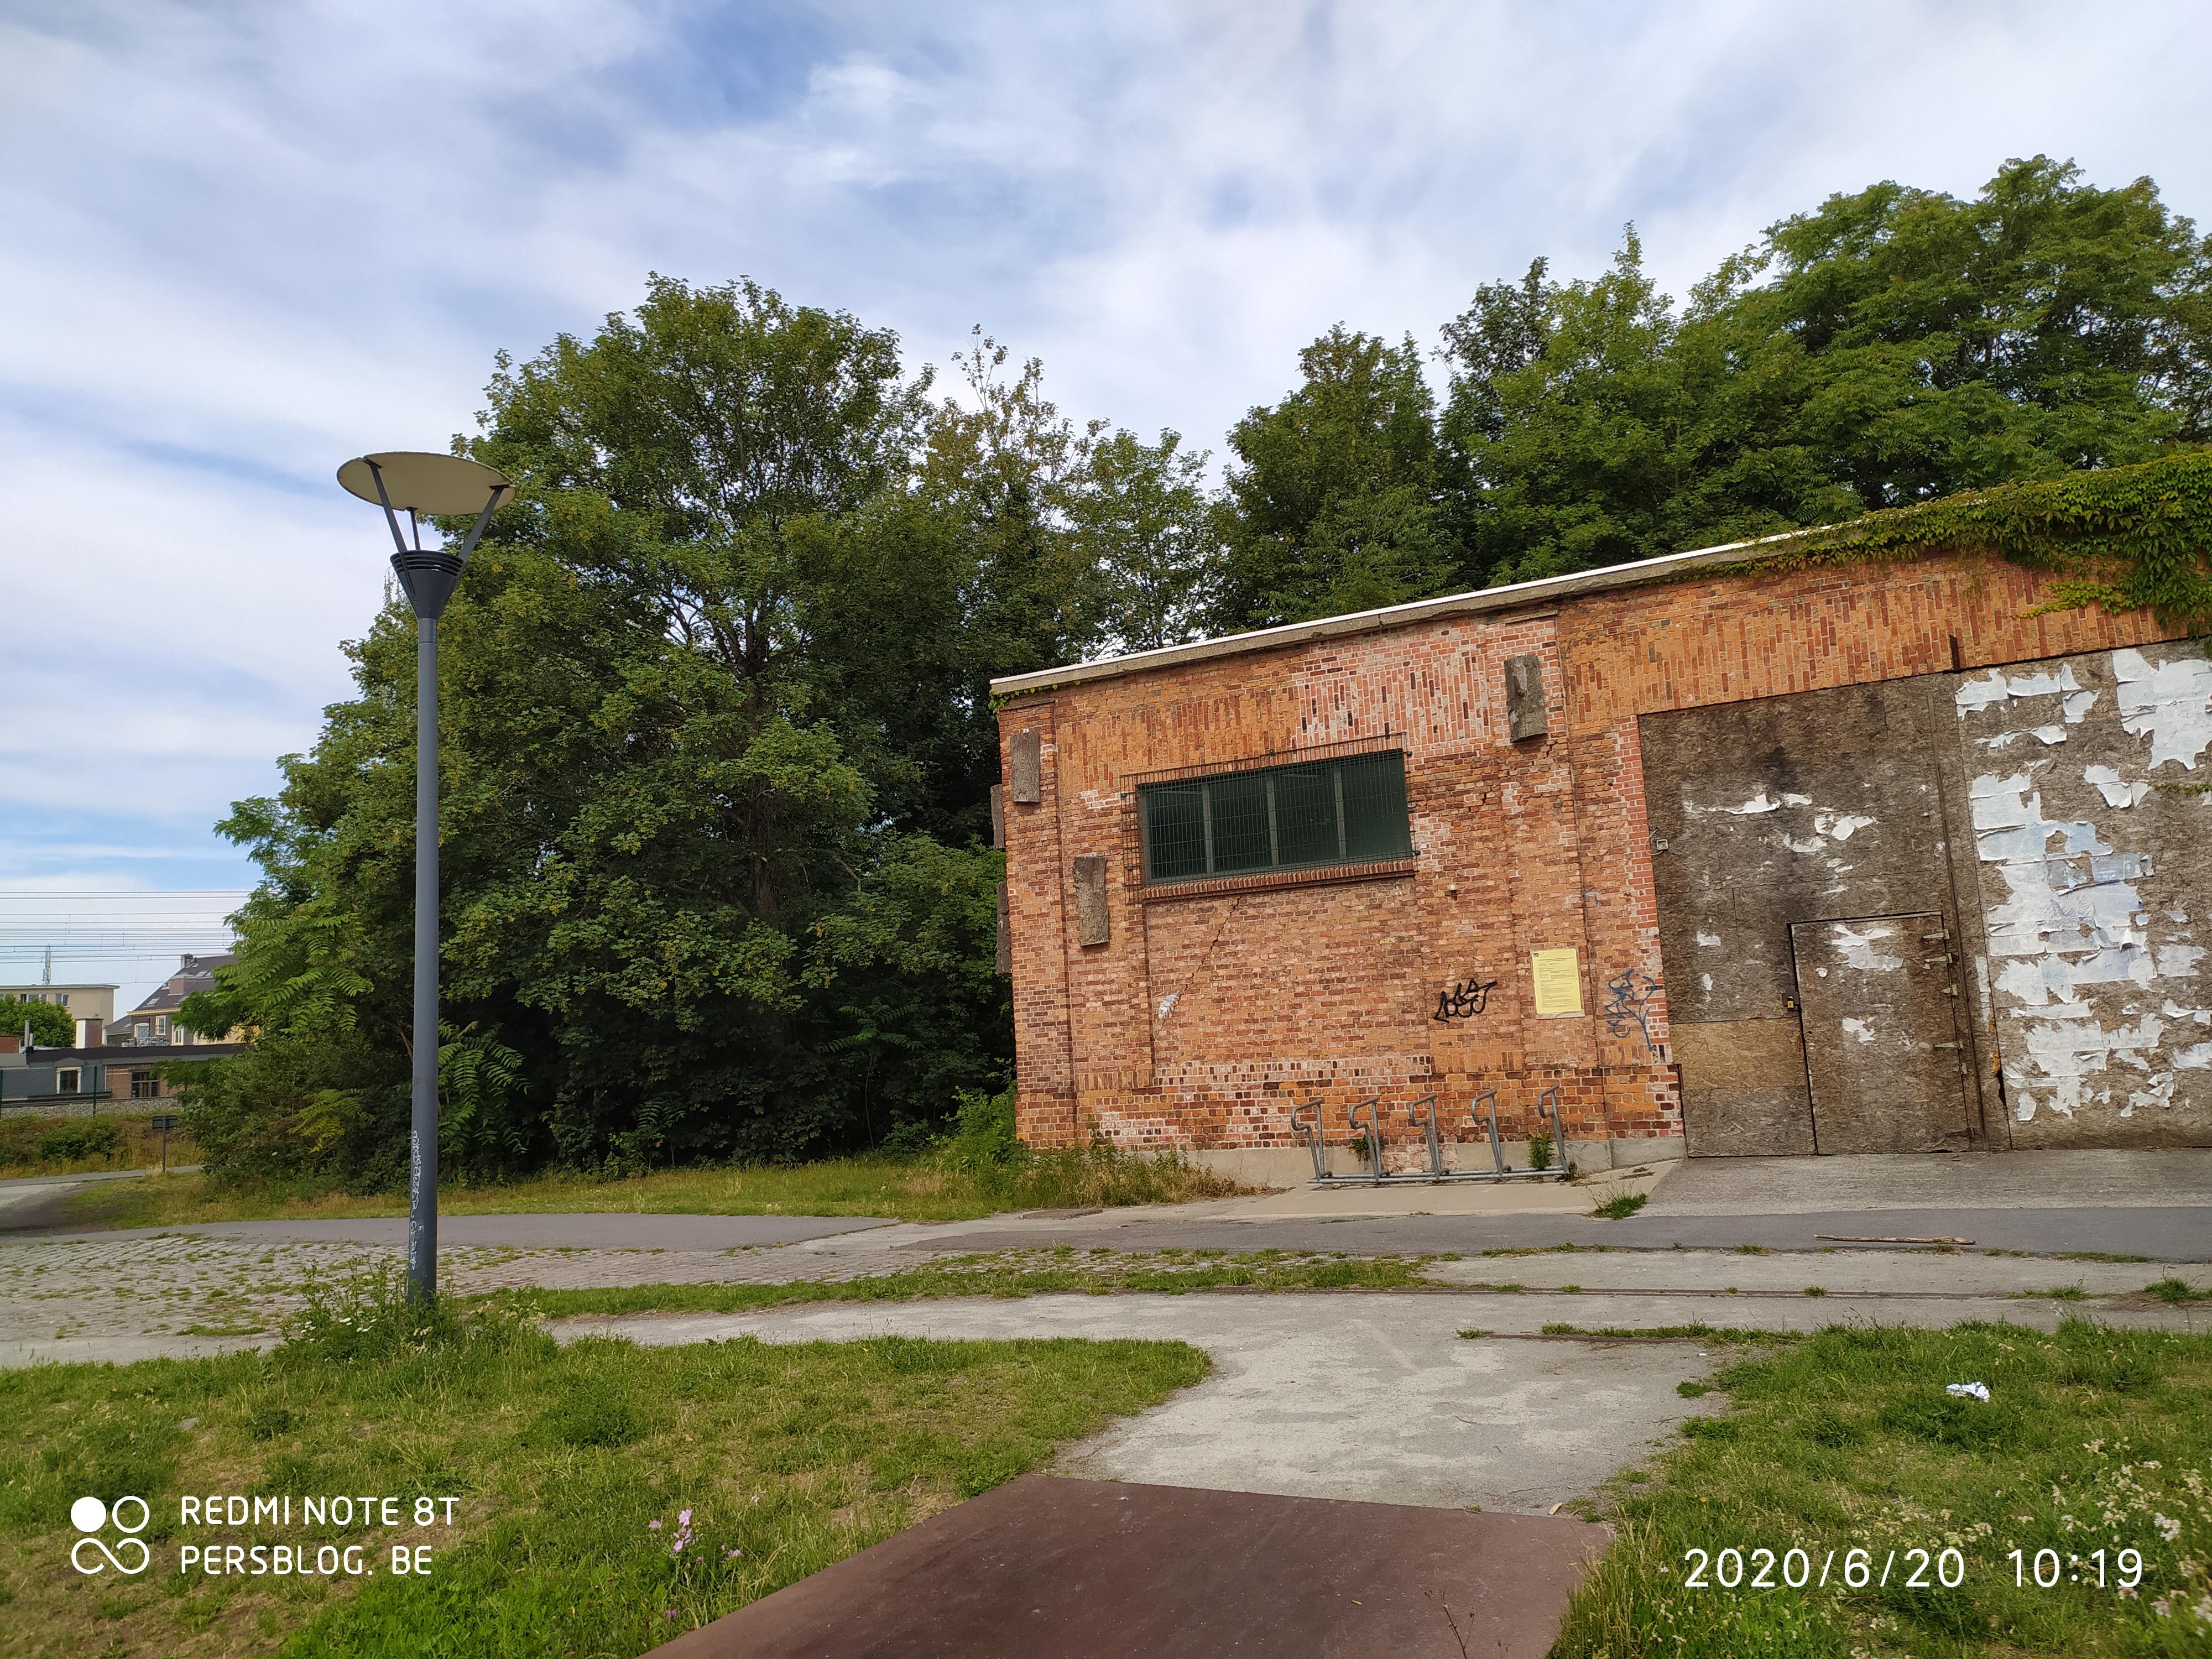 Nijverheidstraat - Bijgaardepark - Sint-Amandsberg IMG_20200620_100410 (7)